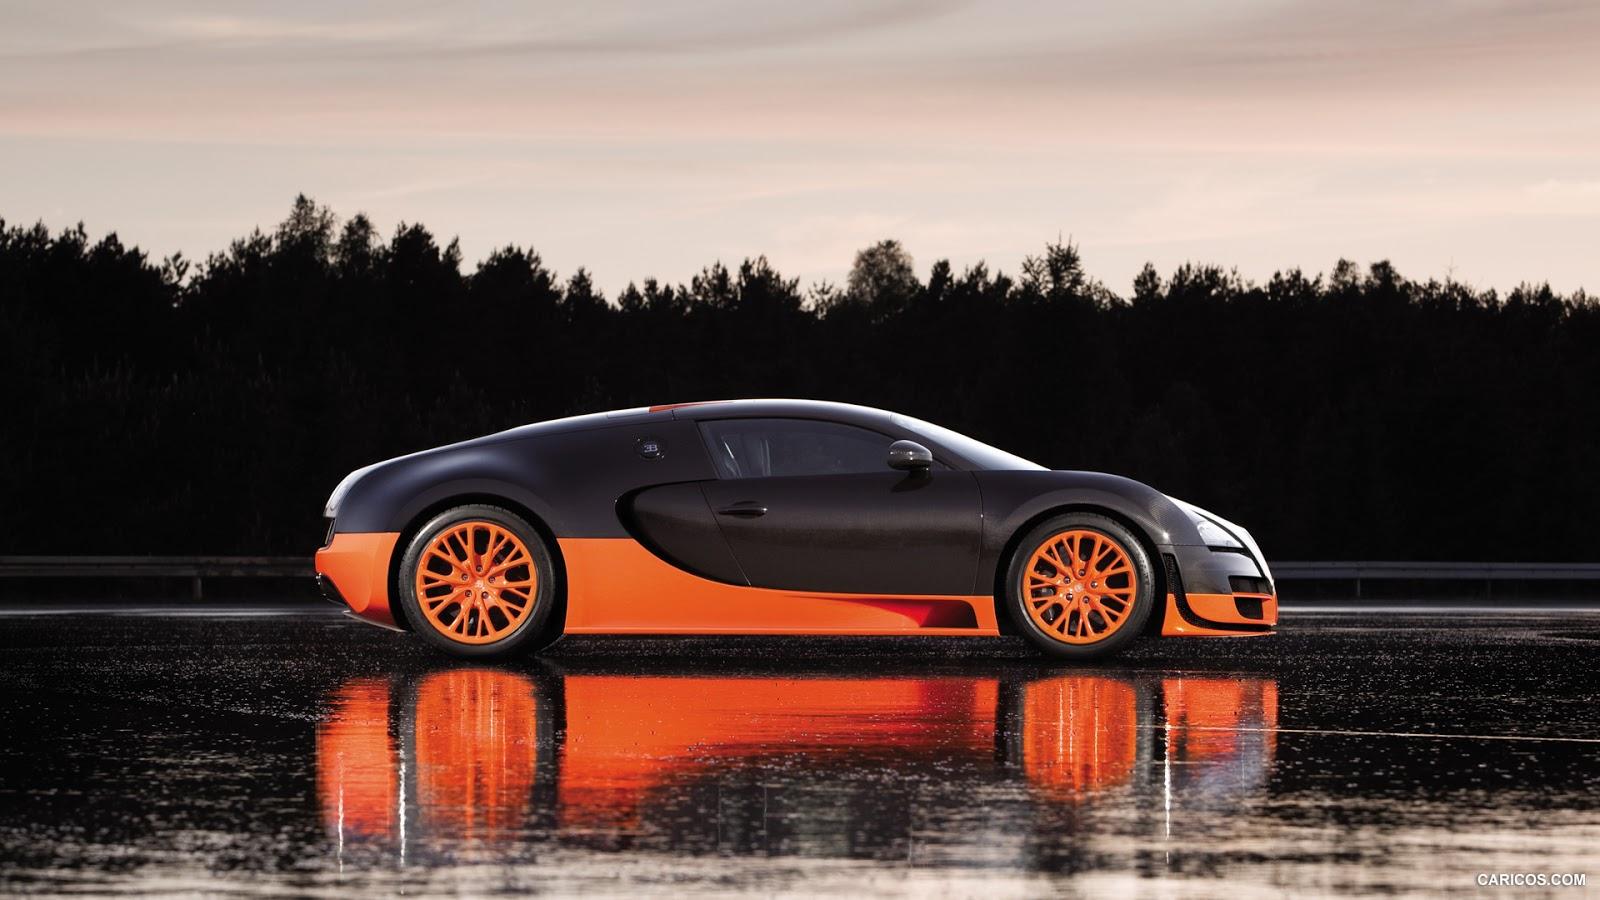 Wallpaper Bugatti Veyron Super Sport: Wallpapers Hd For Mac: The Best Bugatti Veyron Super Sport